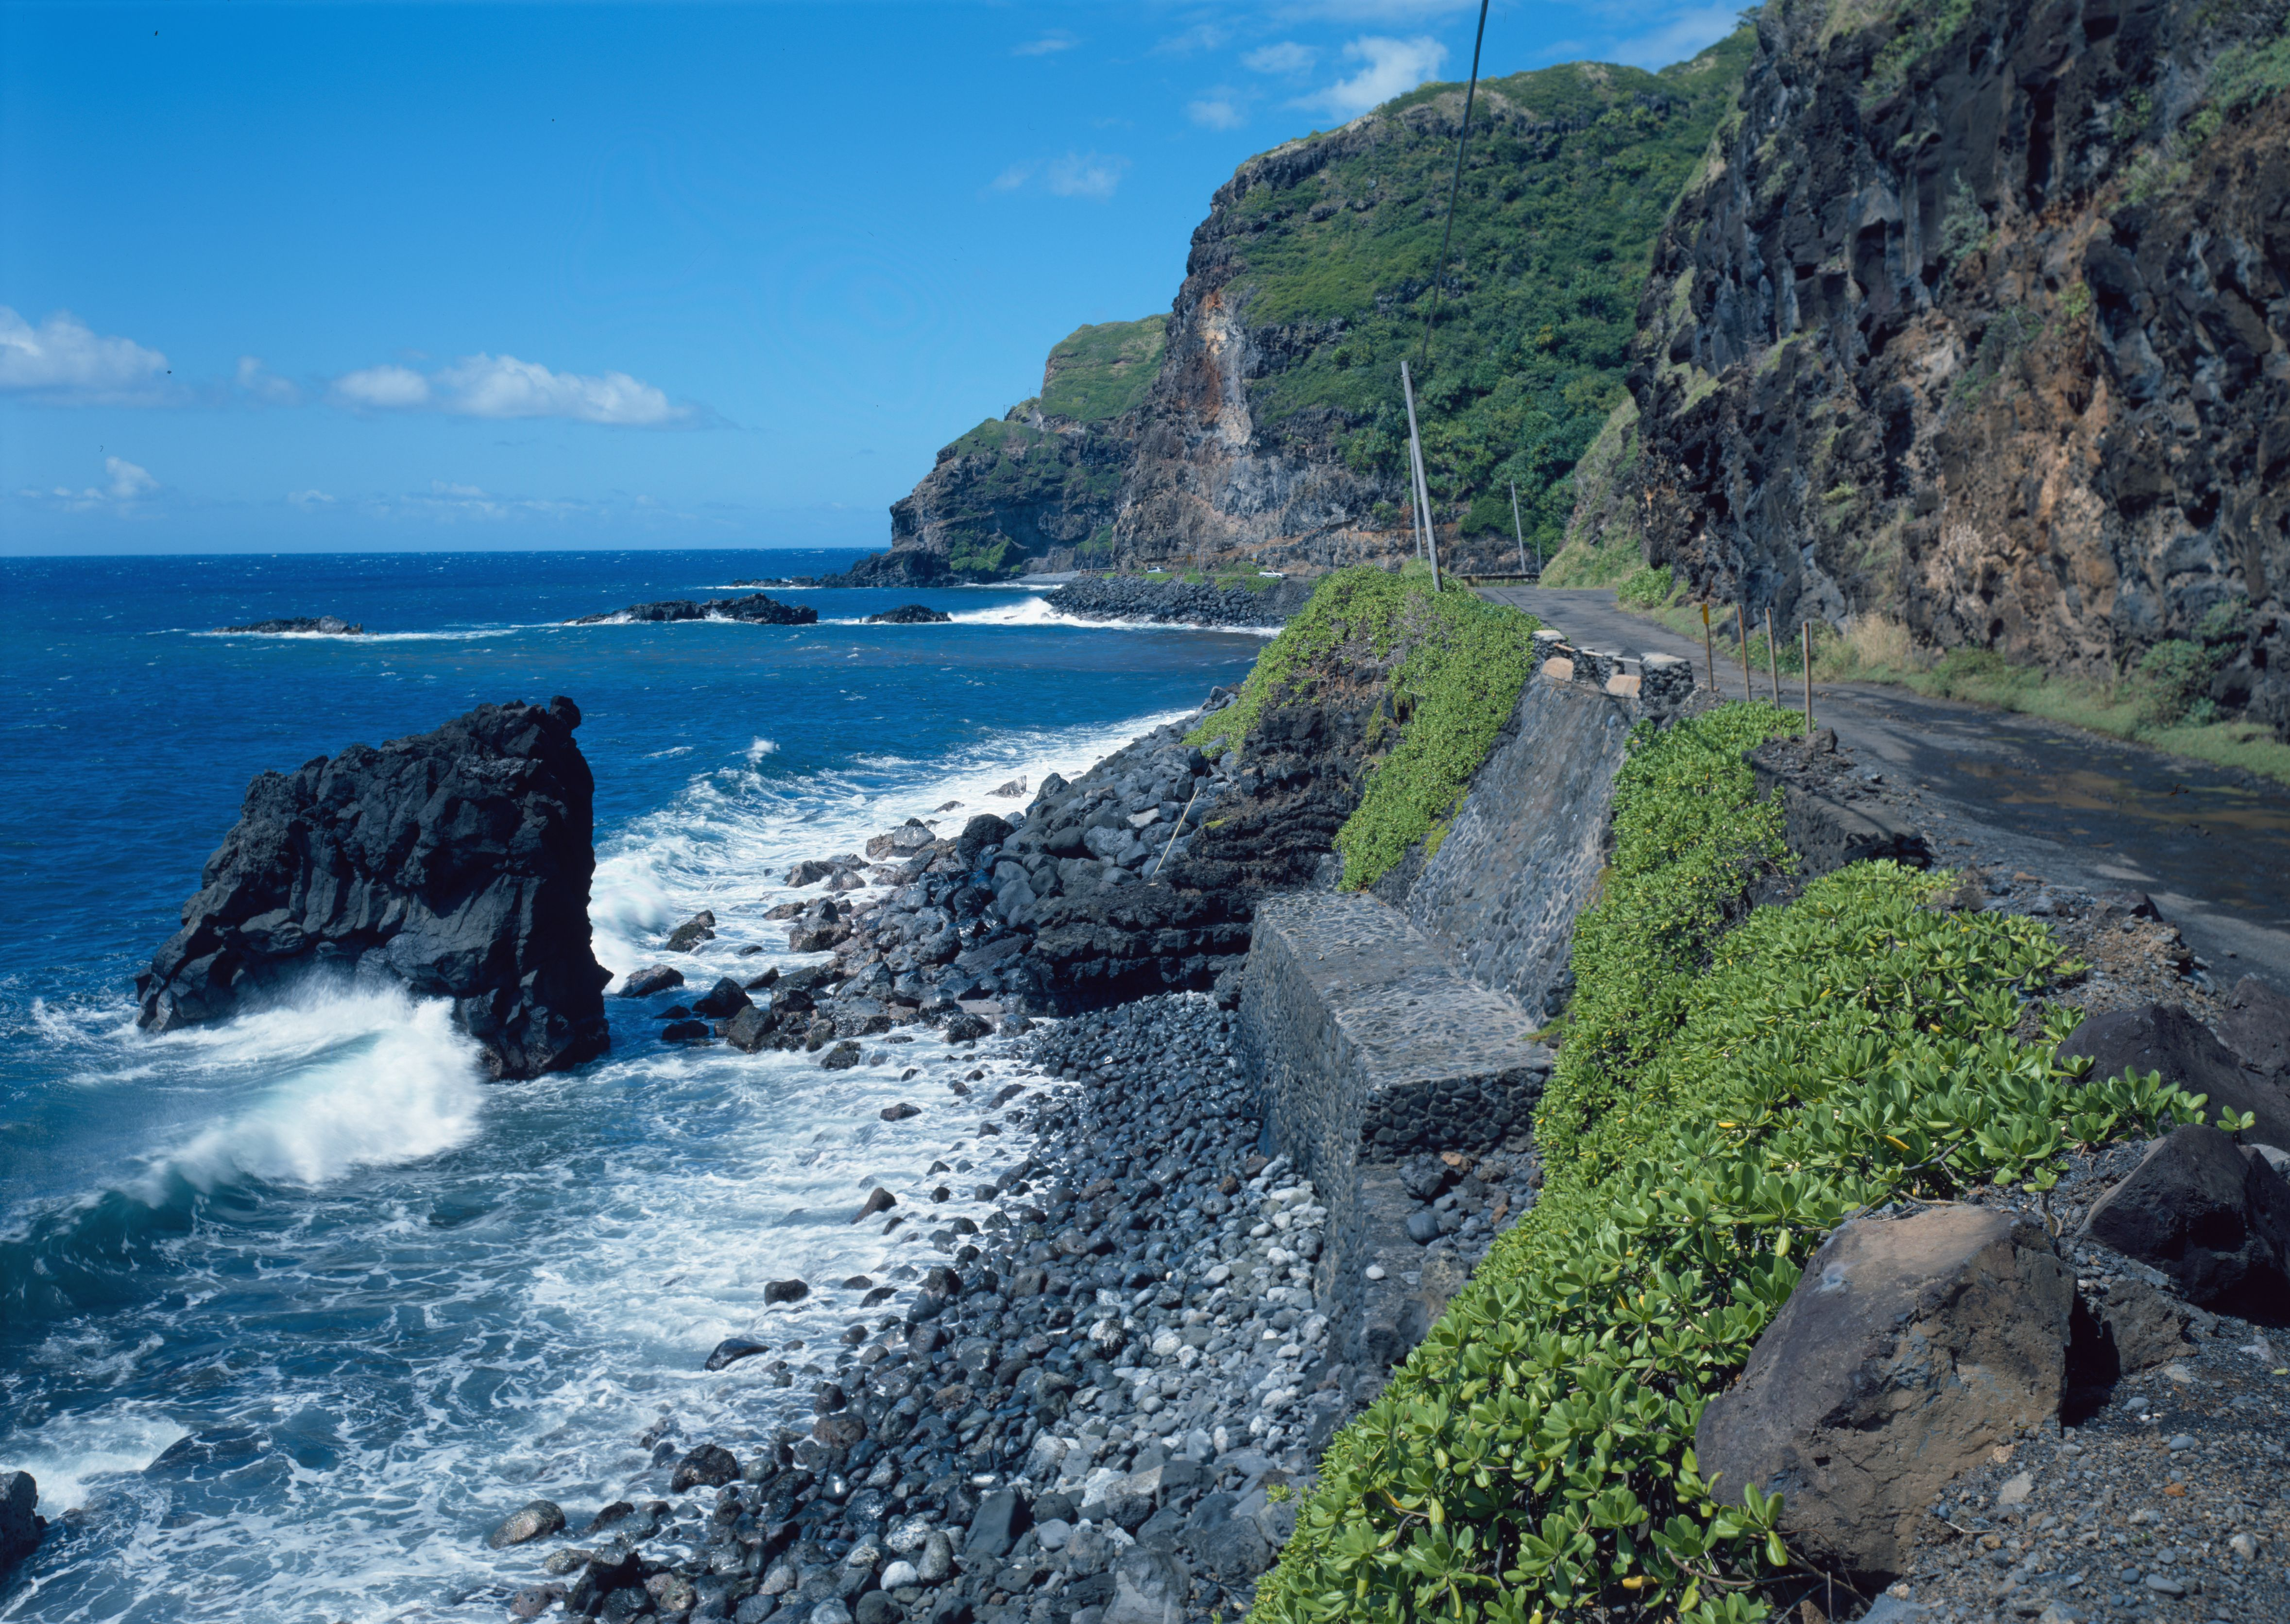 Photo source: wikimedia.org/wikipedia/commons/f/f8/Hana_Belt_Road,_Between_Haiku_and_Kaipahulu,_Hana_vicinity_(Maui_County,_Hawaii).jpg